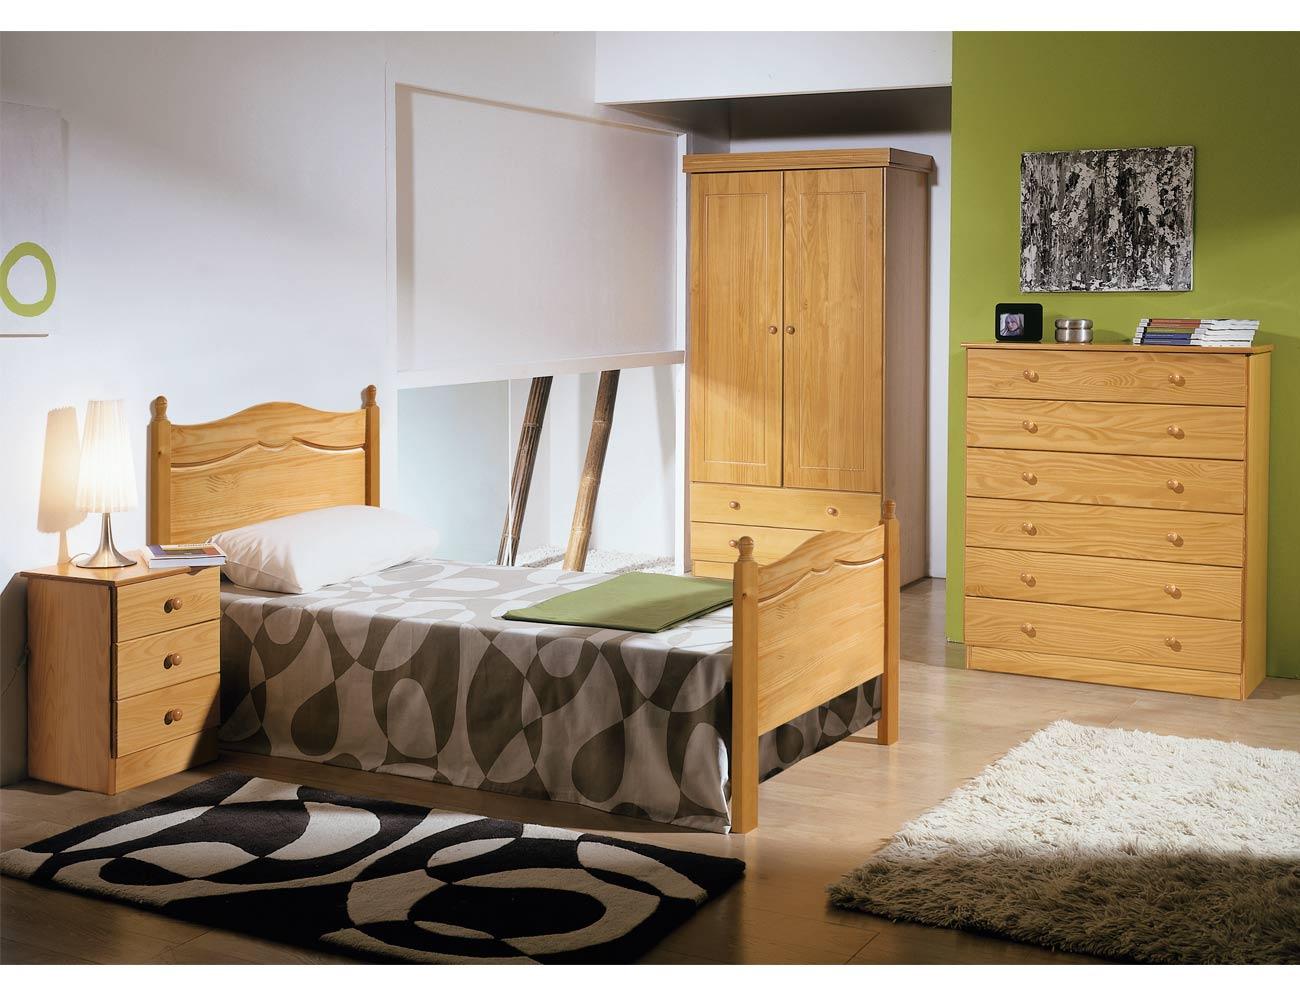 Dormitorio juvenil malaga madera pino provenzal3